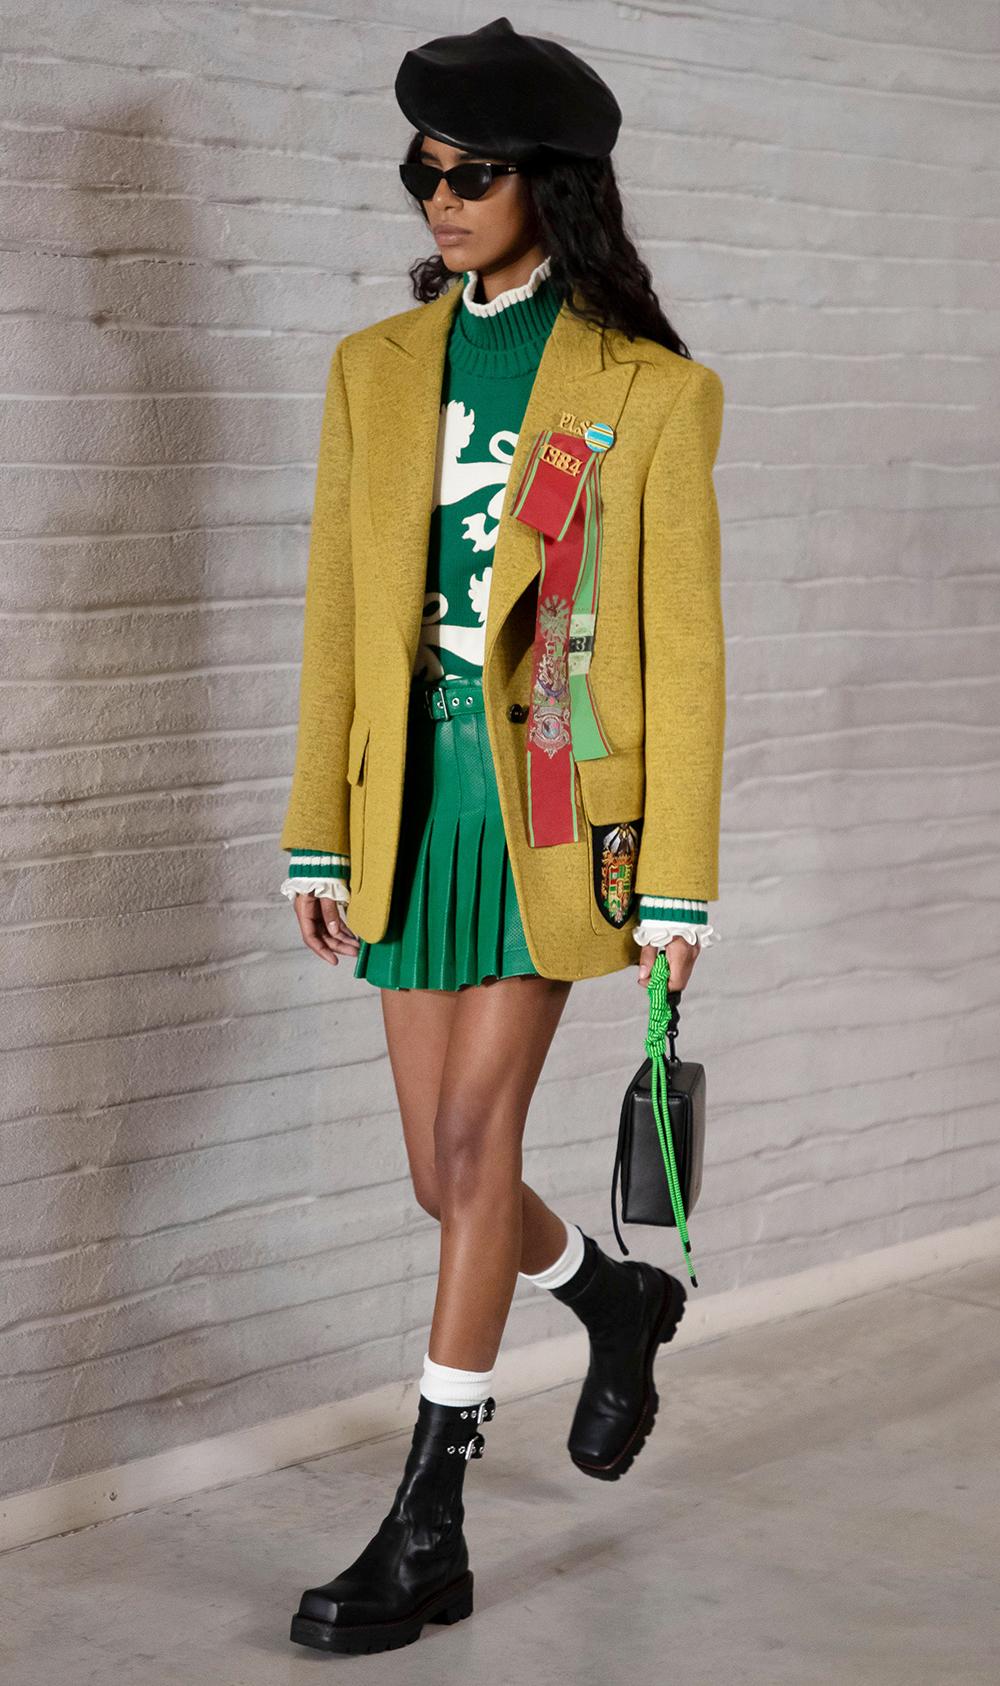 Best MFW Looks I Philosophy by Lorenzo Serafini Fall 2021 #fashionblog #fallfashion #outfitinspo